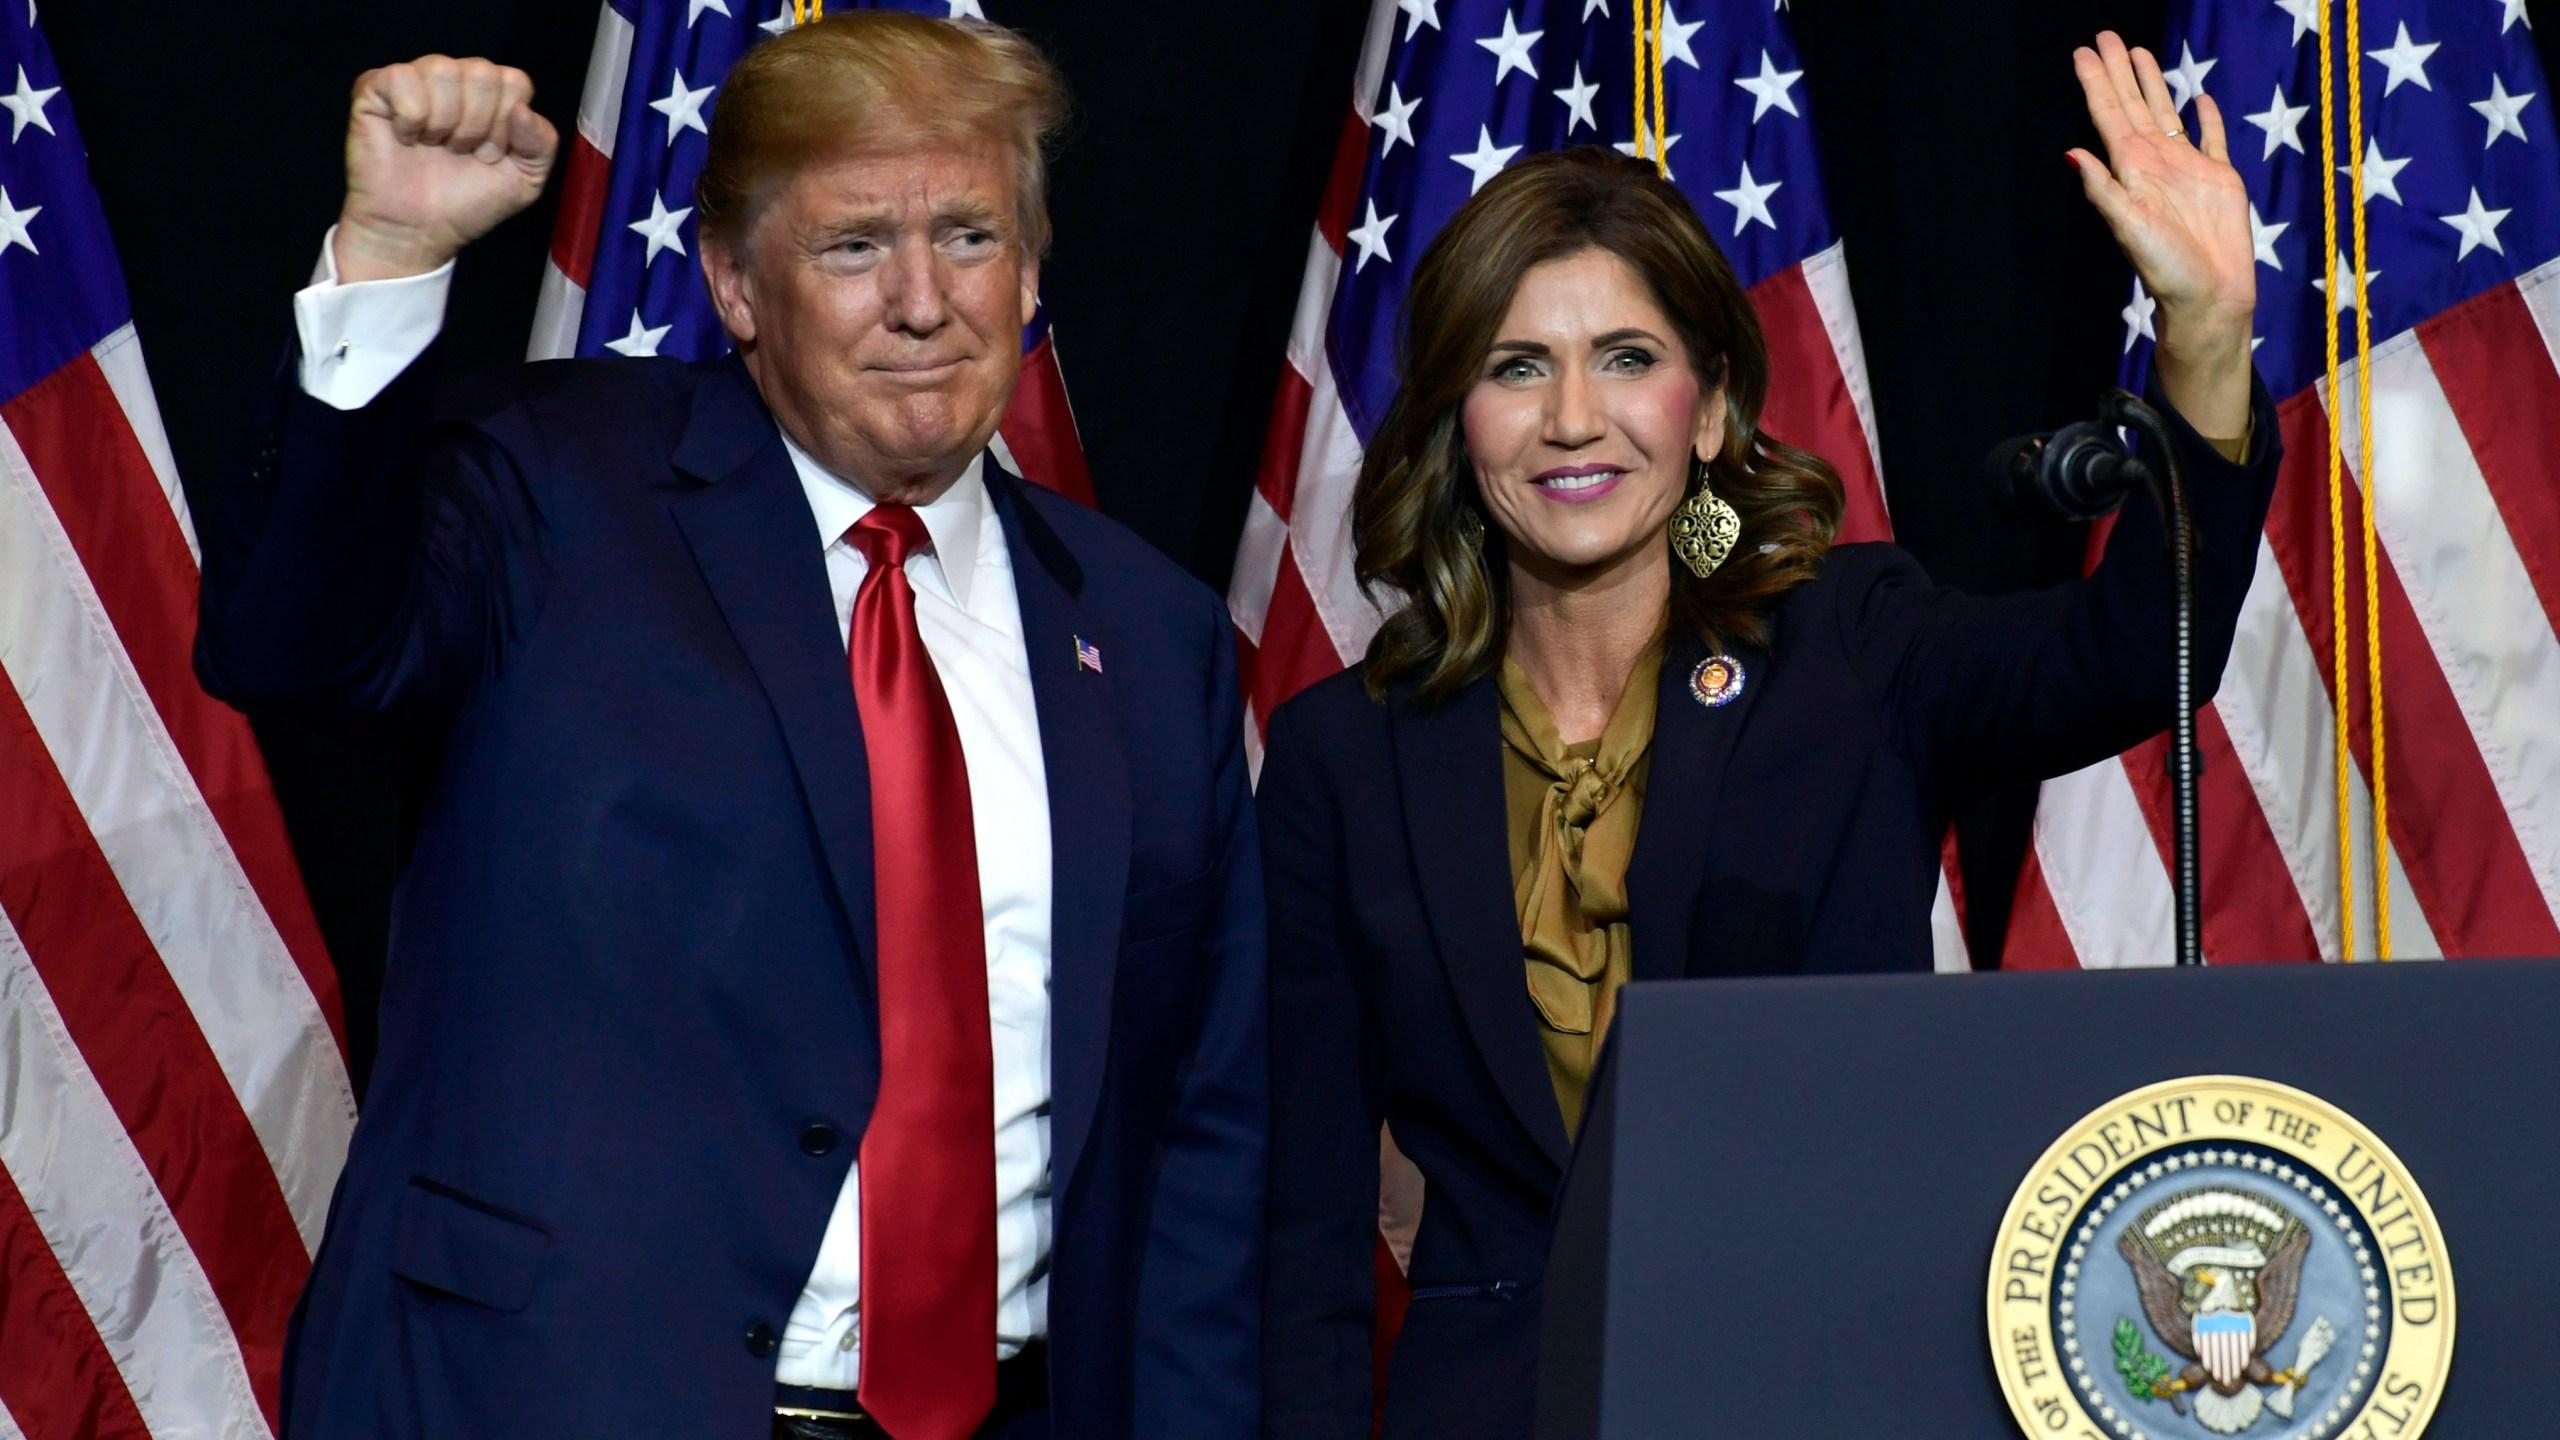 Donald Trump, Kristi Noem